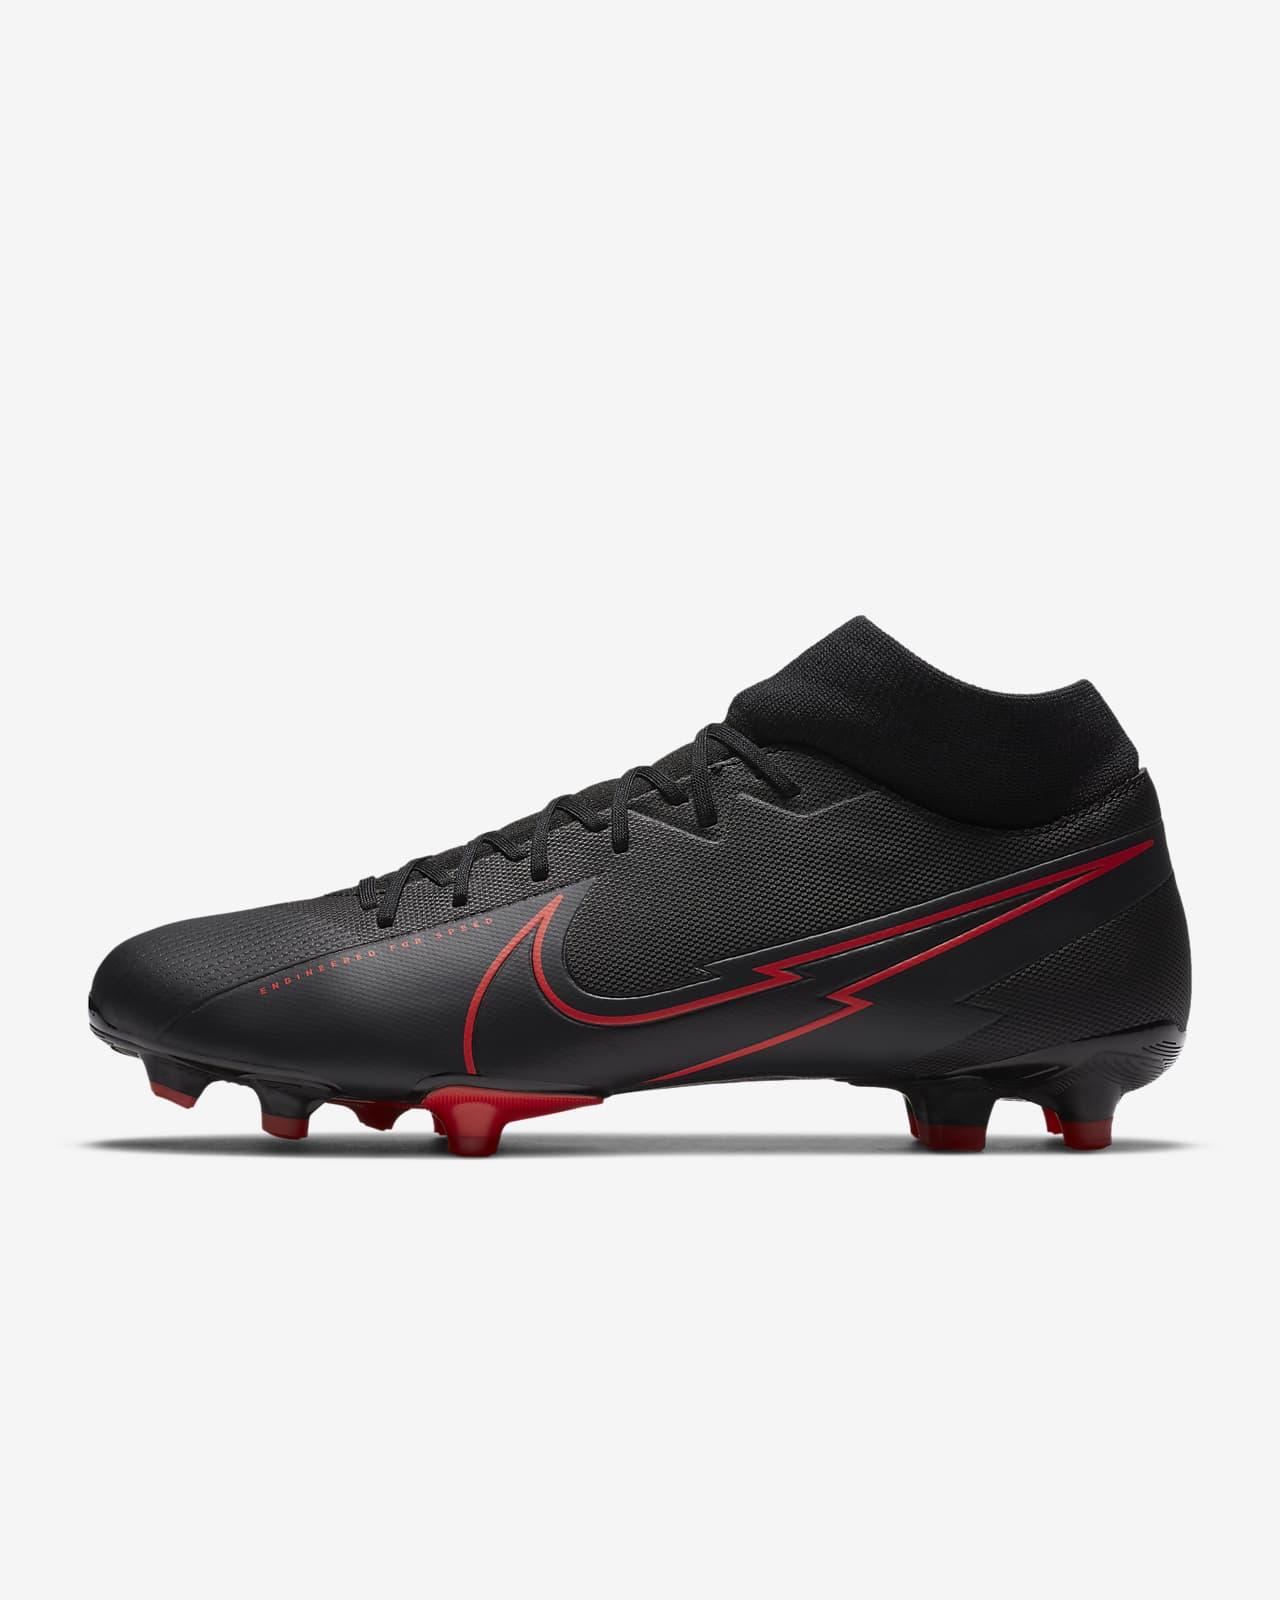 Scarpa da calcio multiterreno Nike Mercurial Superfly 7 Academy MG